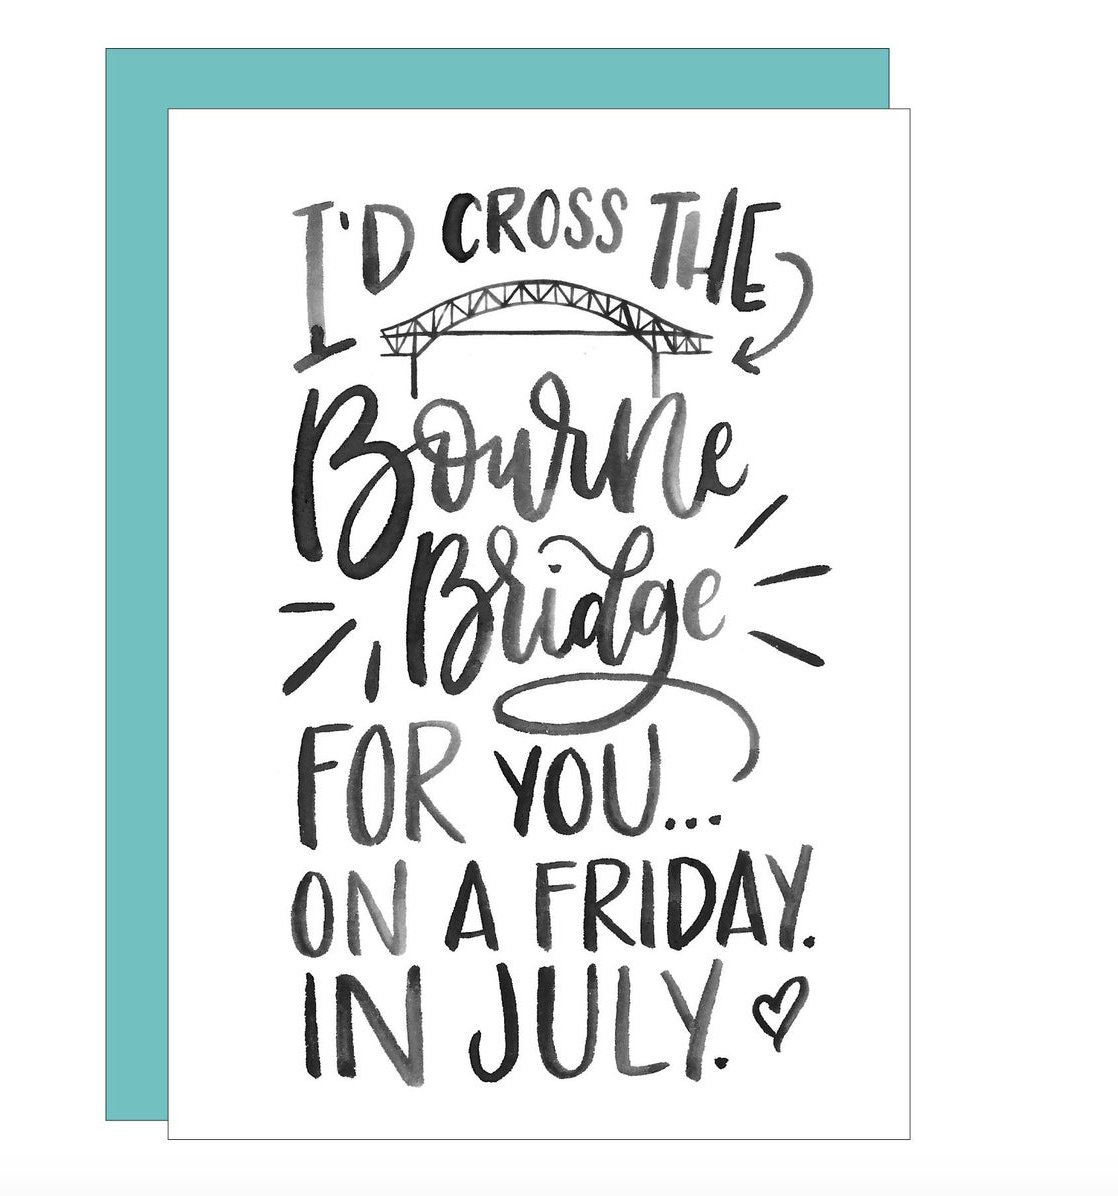 Kate Elizabeth Lettering Cape Cod Greeting Card Funny